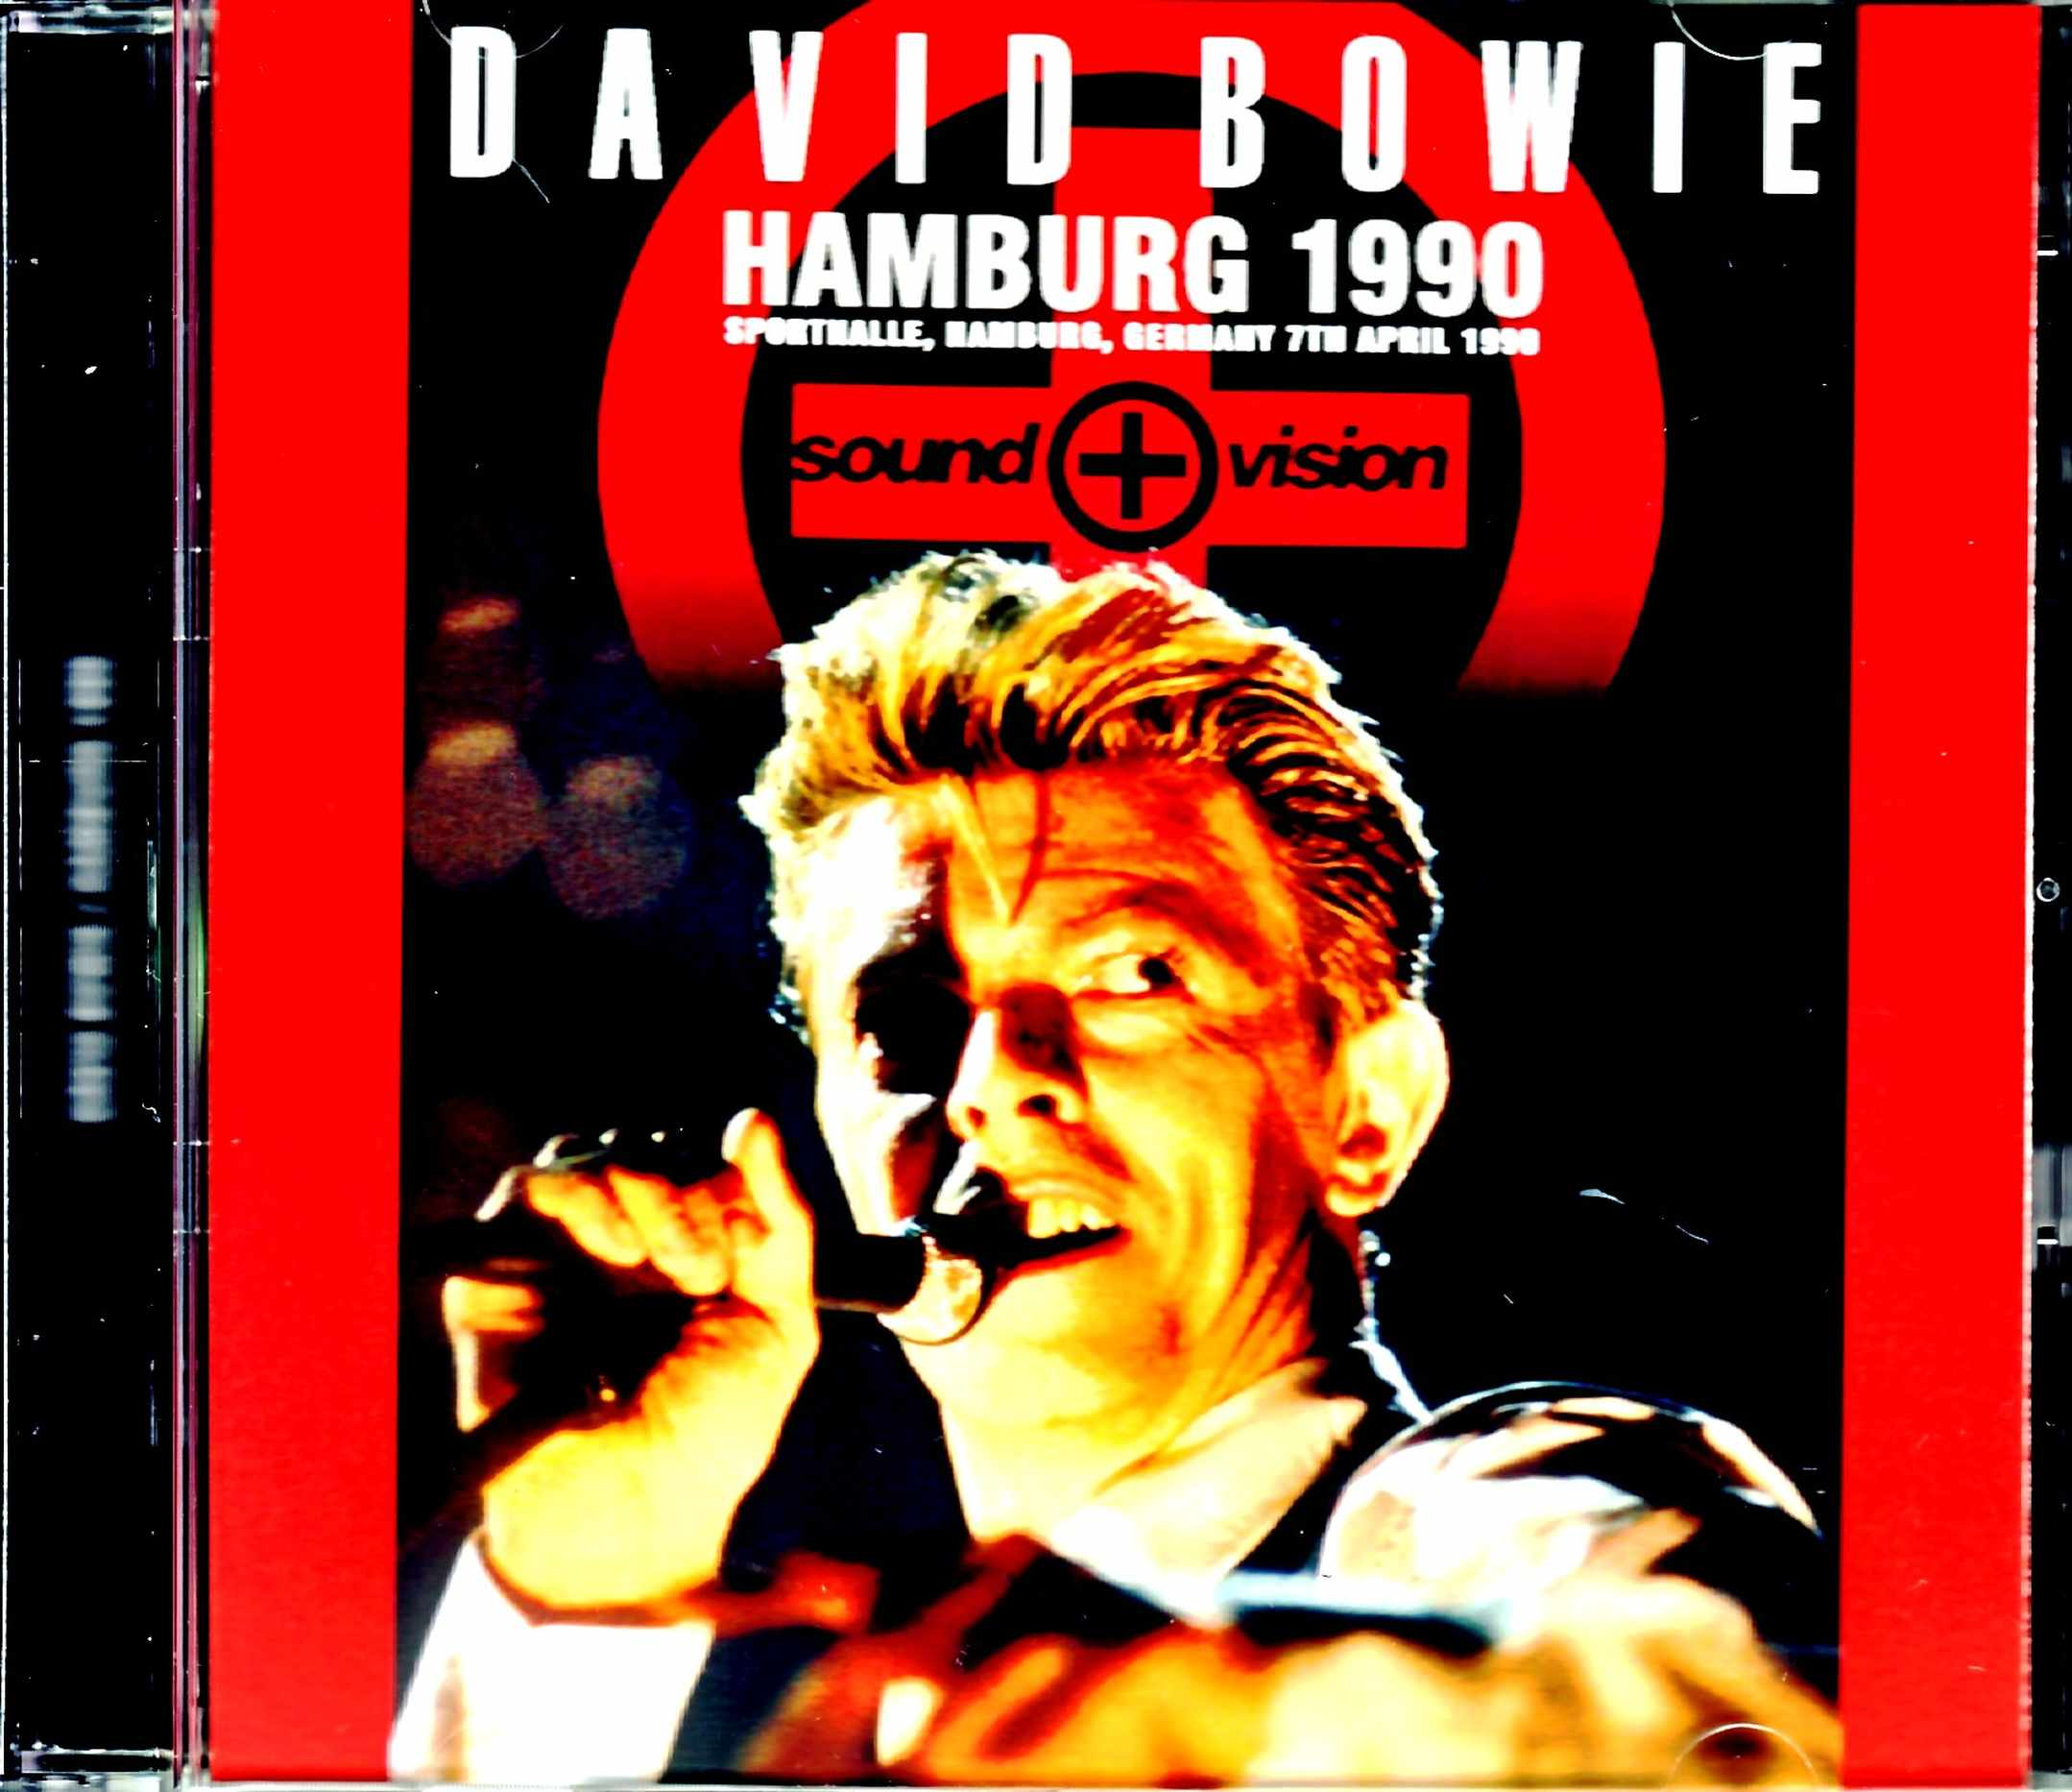 David Bowie デヴィッド・ボウイ/Germany 4.7.1990